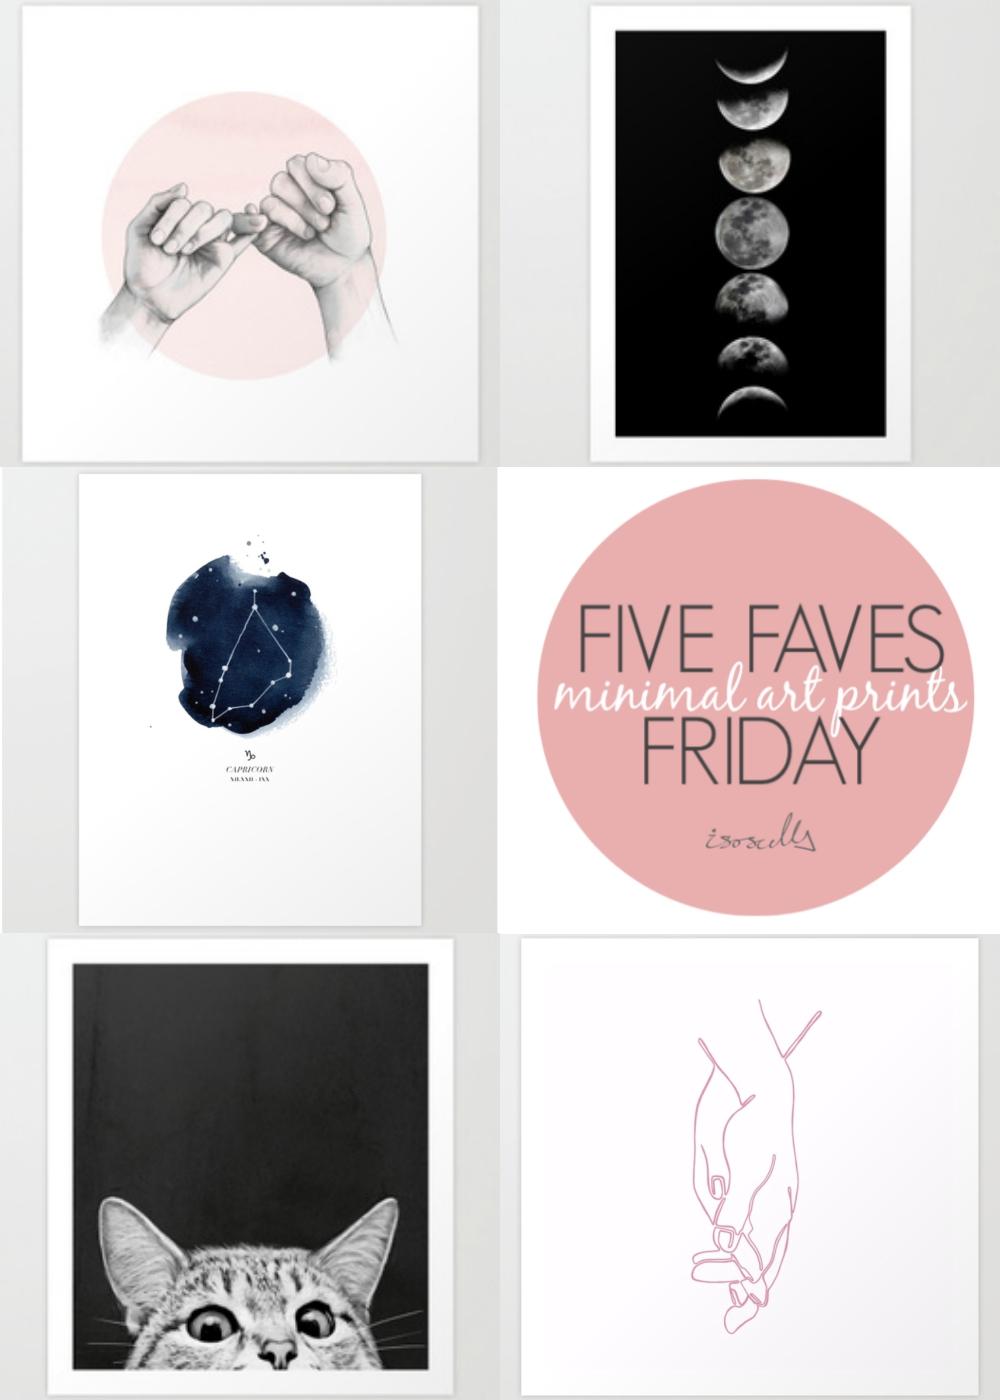 Five Faves Friday - Minimal Art Prints on Isoscella